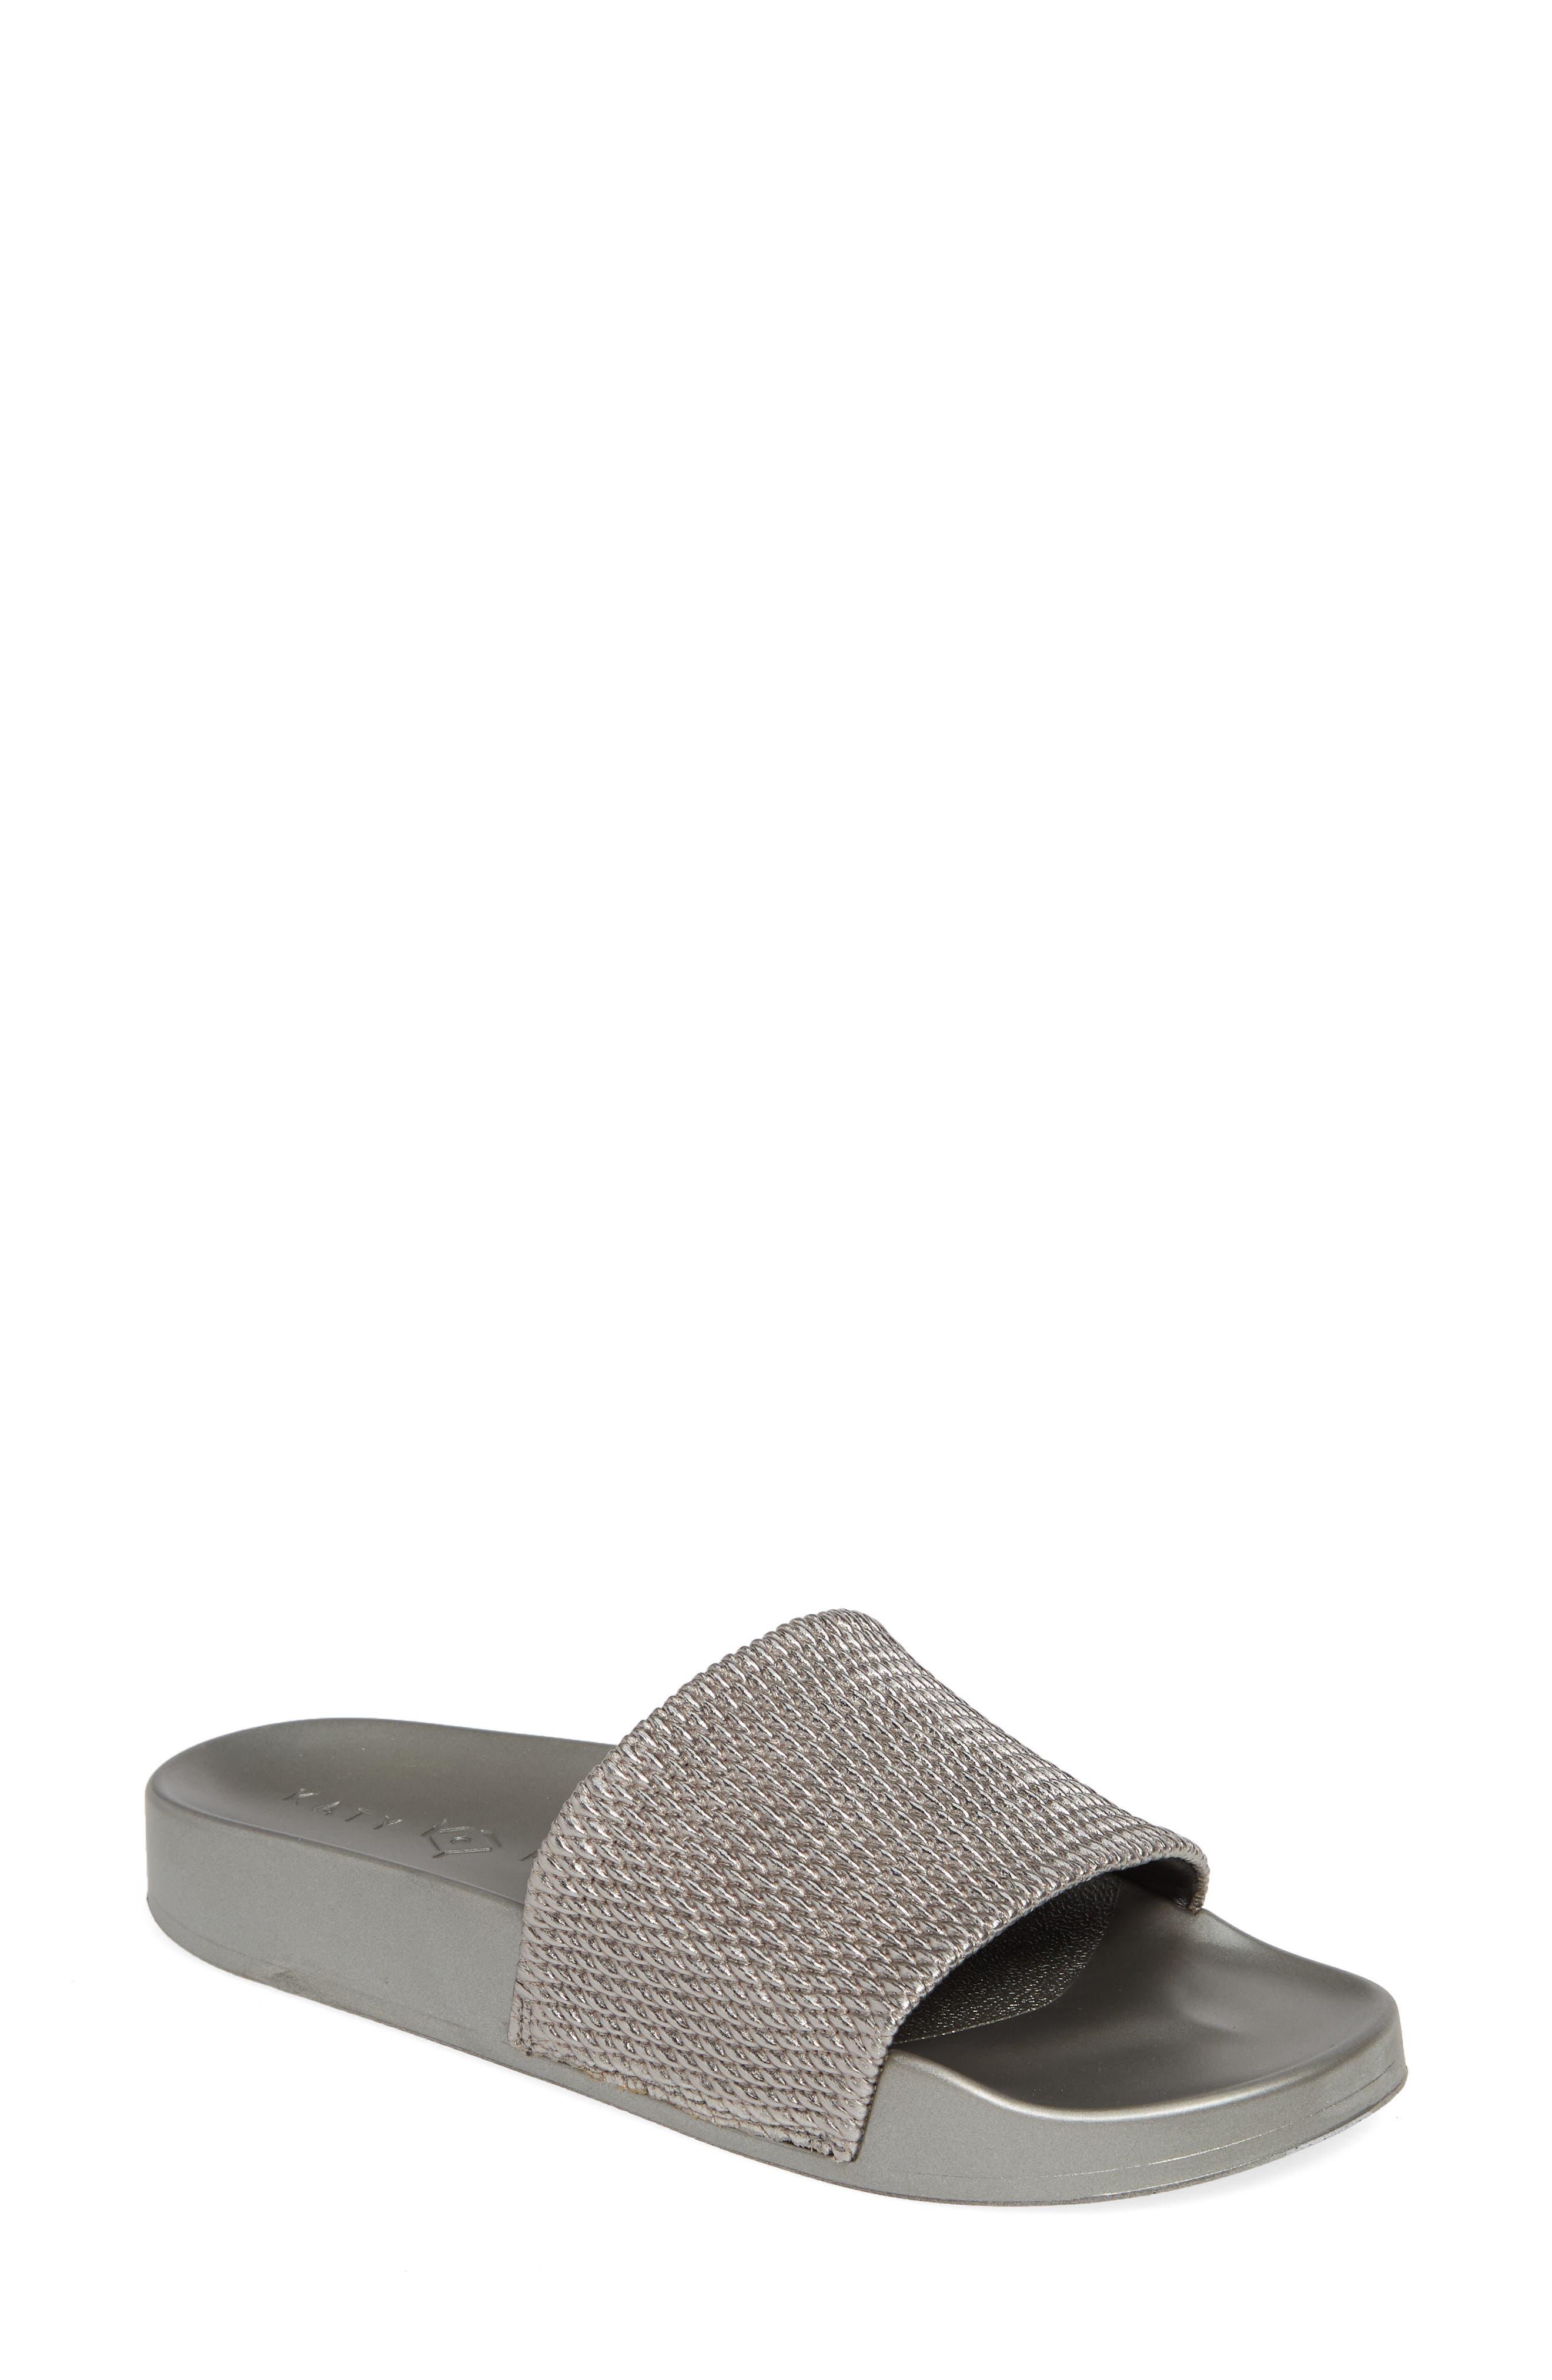 women's katy perry the jimmi slide sandal, size 8 m - grey